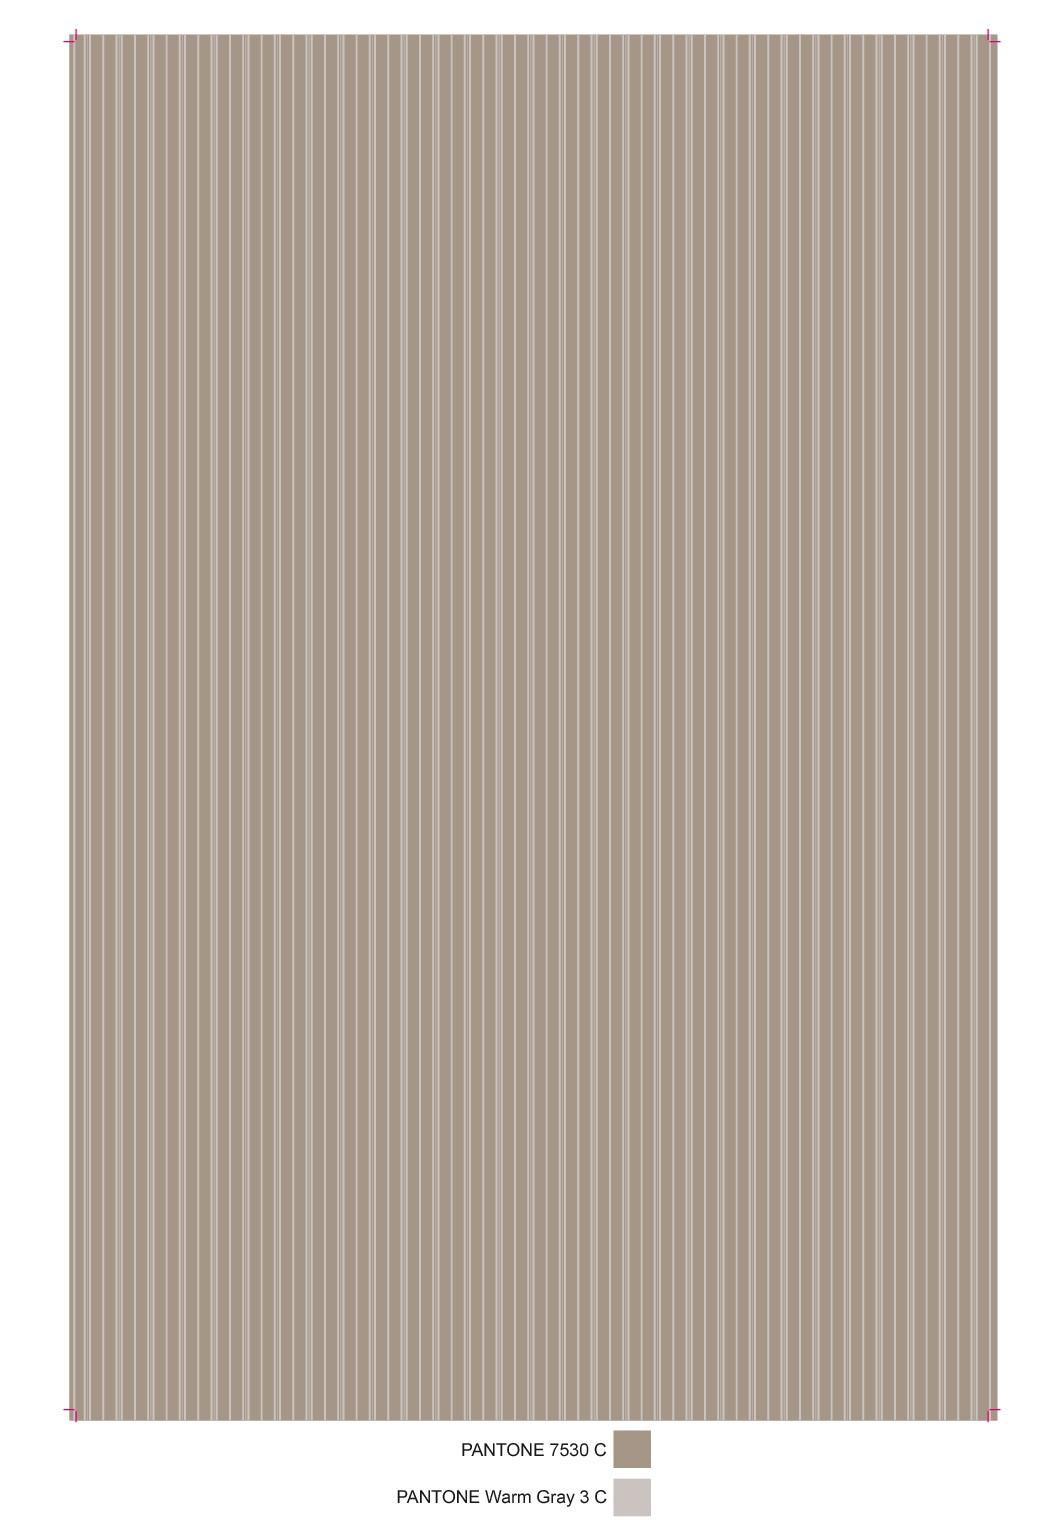 Pattern for Blanket